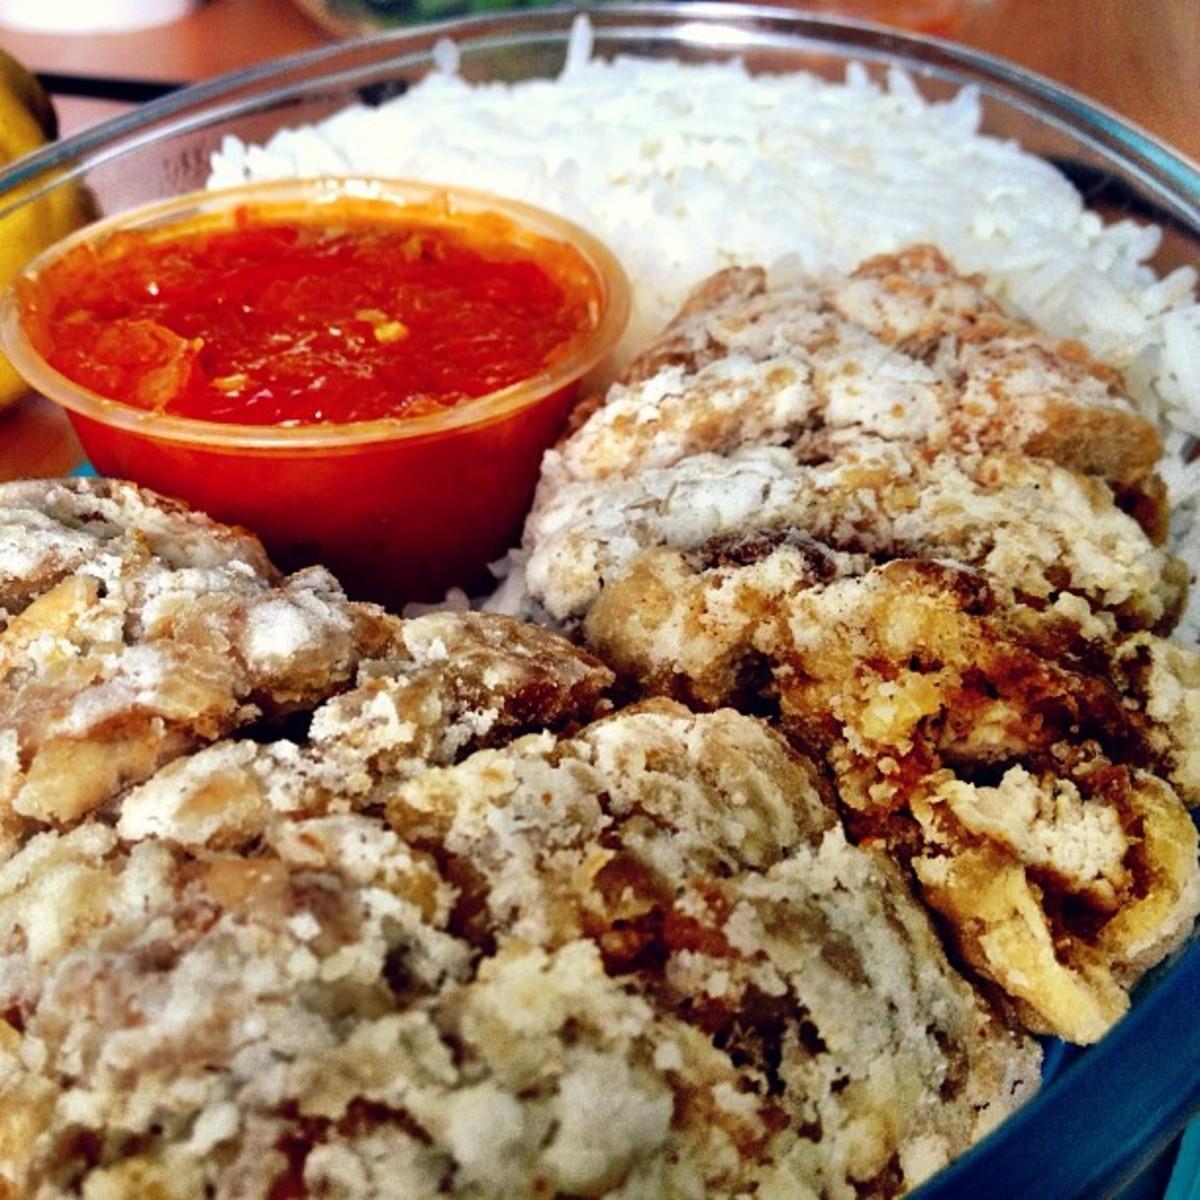 Nasi katok is a national dish of Brunei.